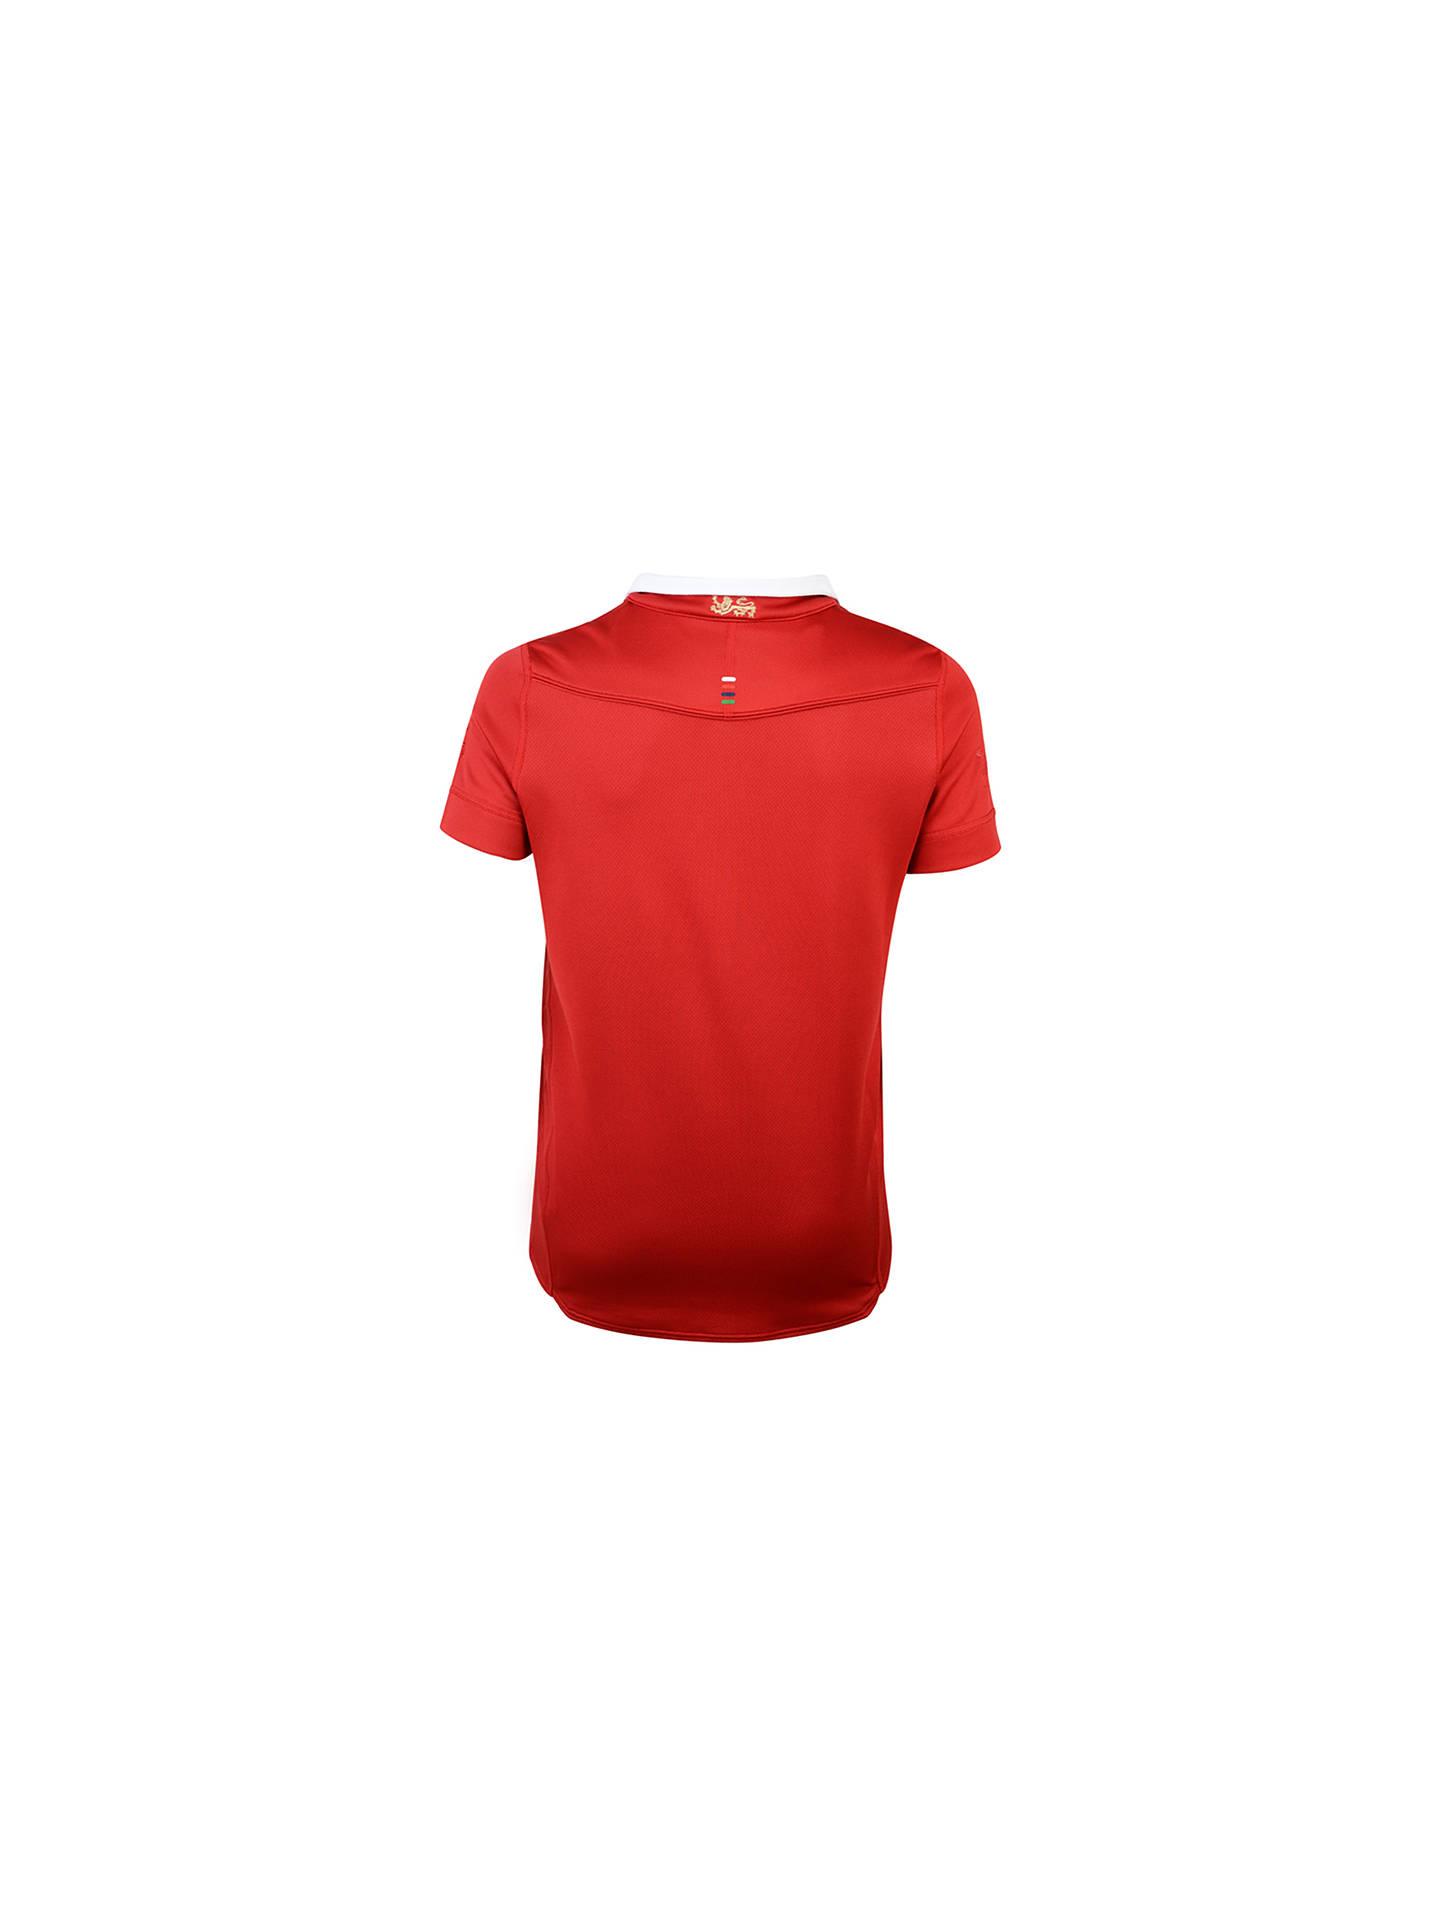 cf4e840d036 ... Buy Canterbury of New Zealand British and Irish Lions Match Day Pro  Children's Rugby Shirt, ...